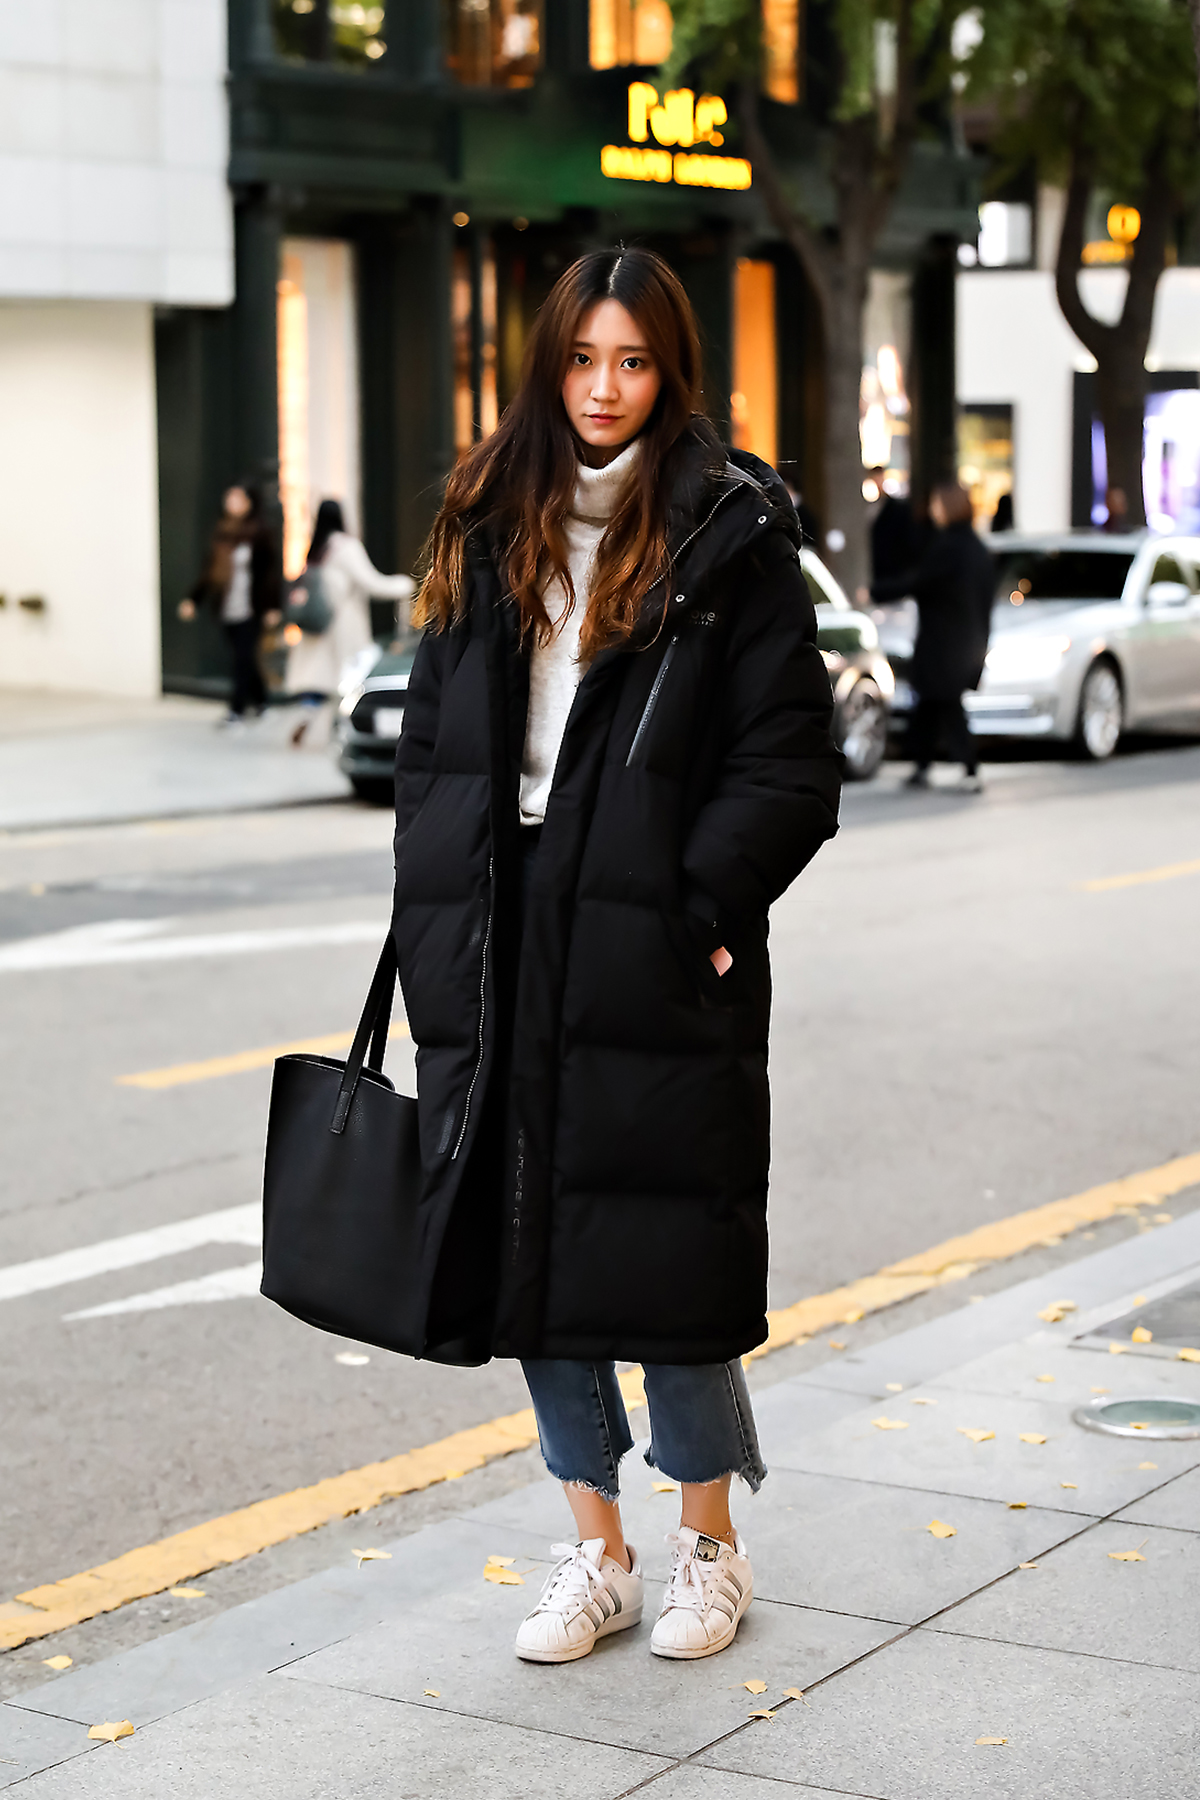 Women fall street style last week of october 2018 inseoul 12